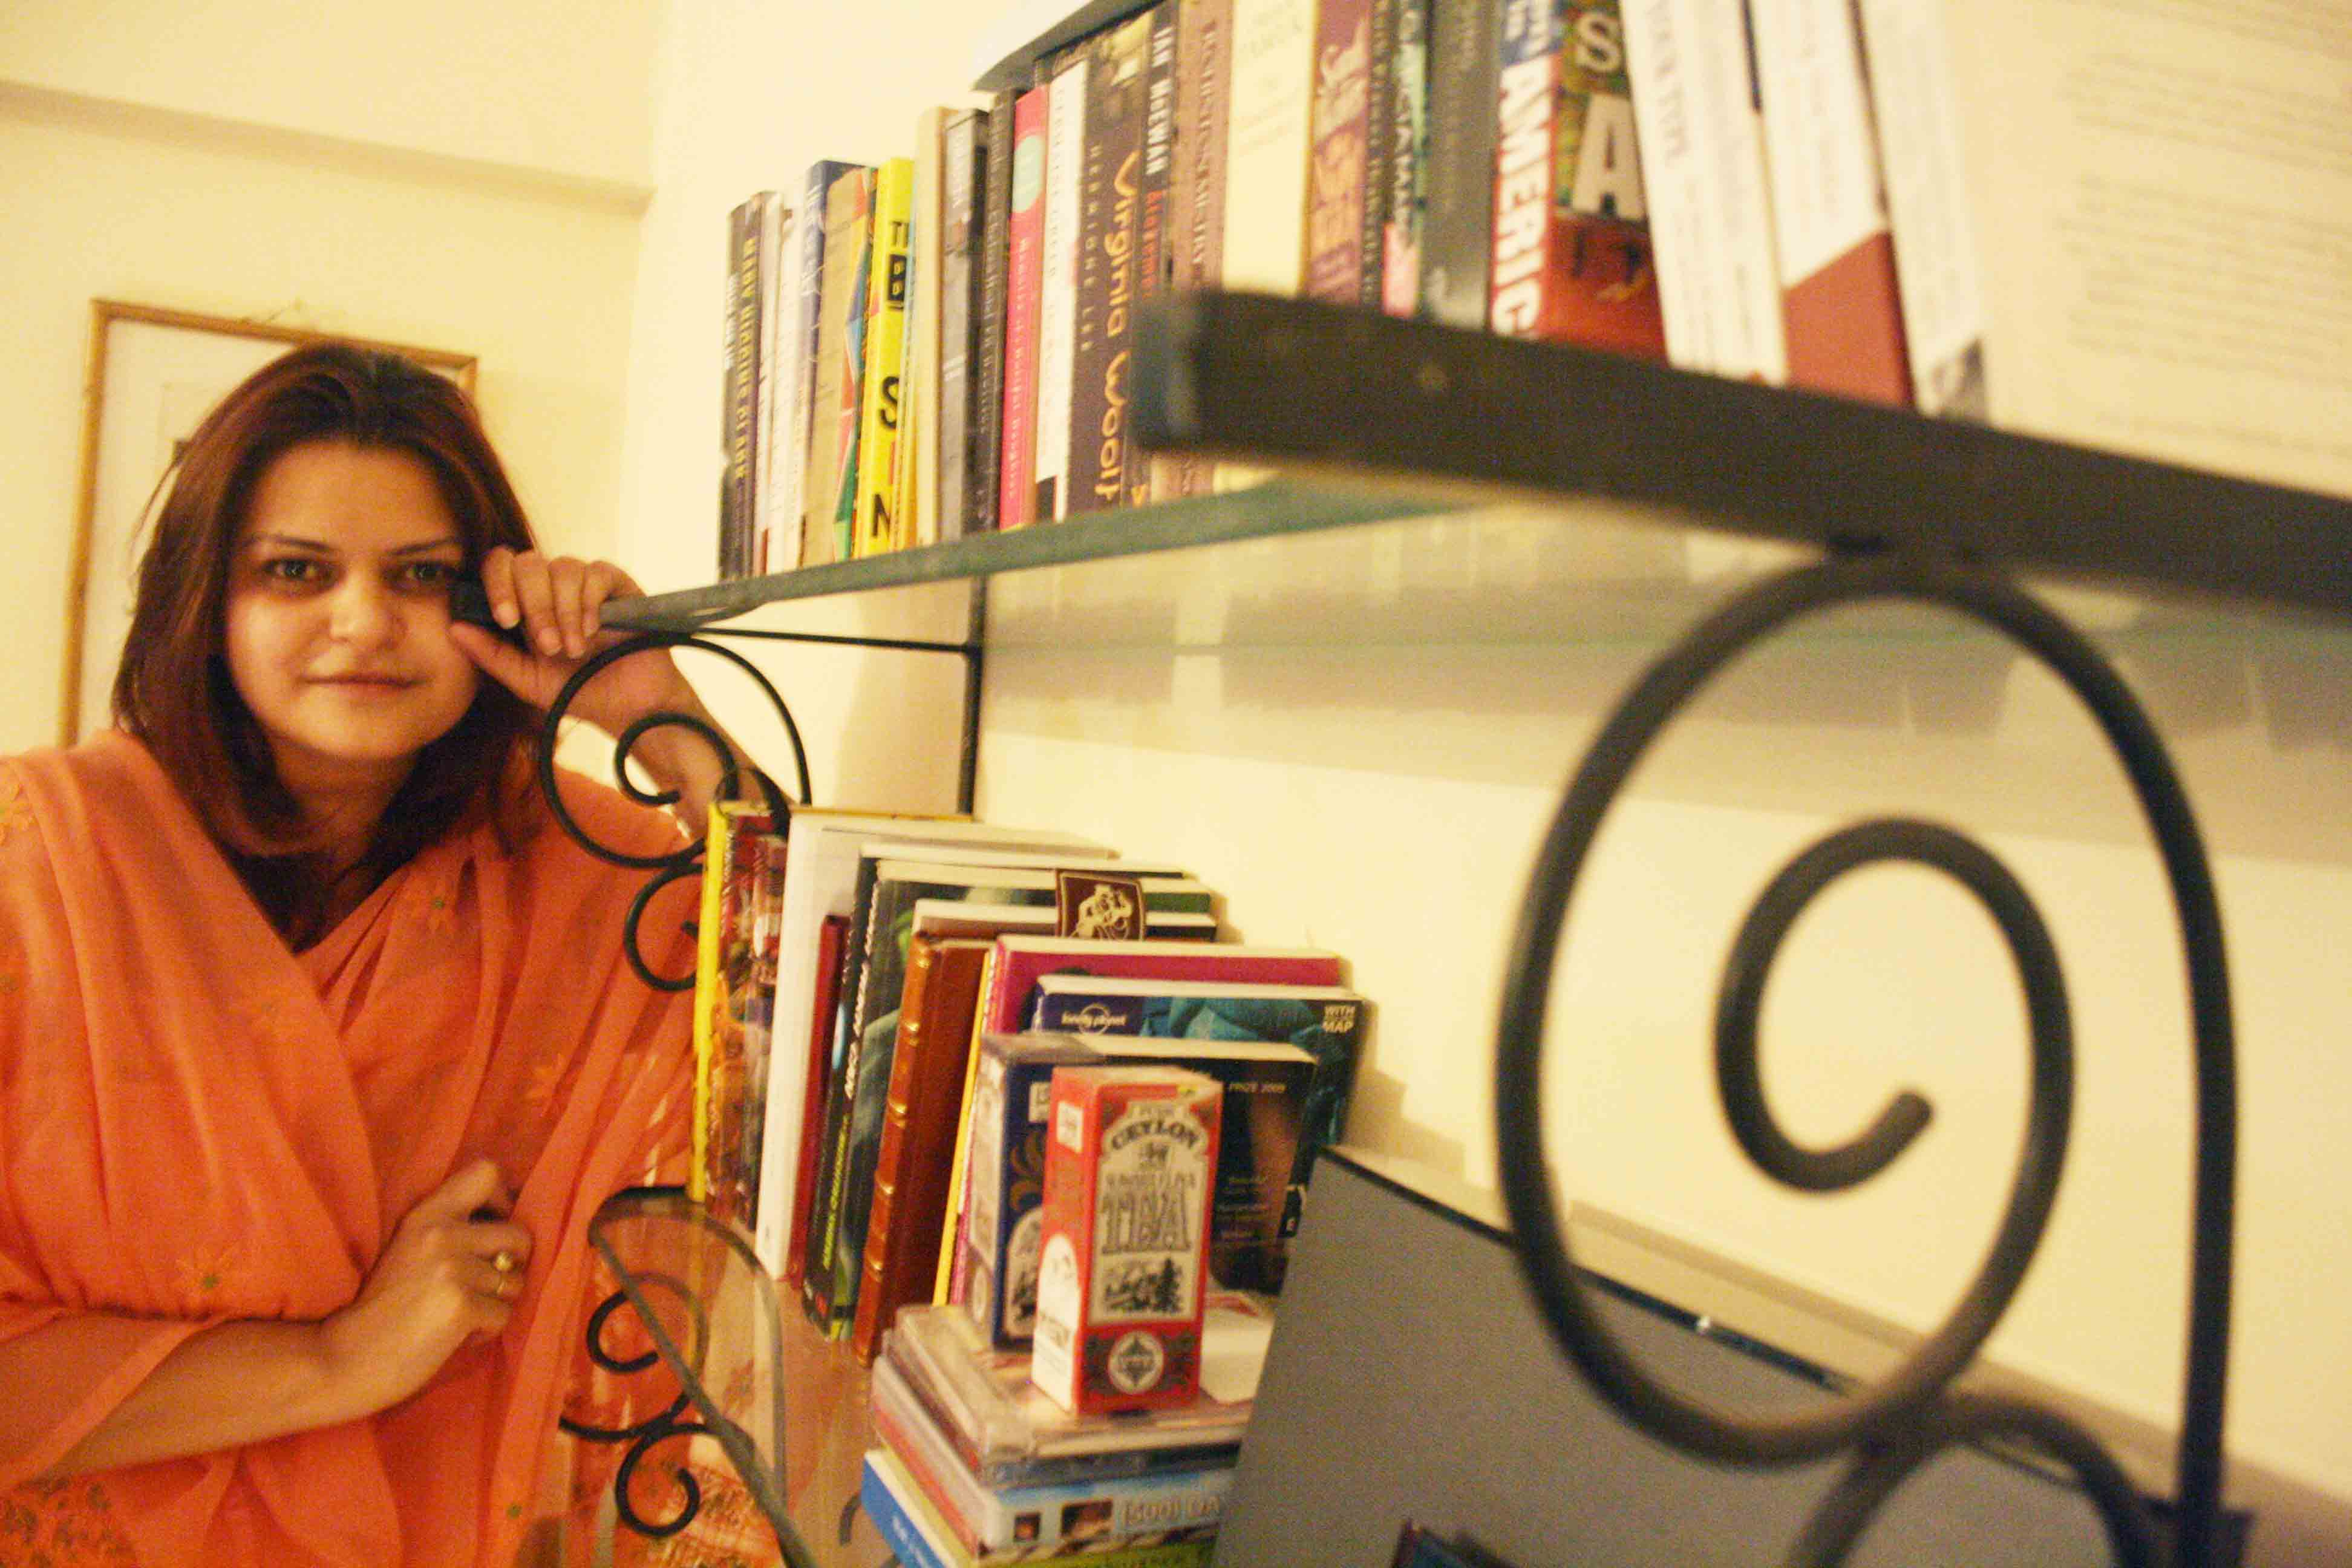 City Library - Advaita Kala's Books, Nizamuddin East